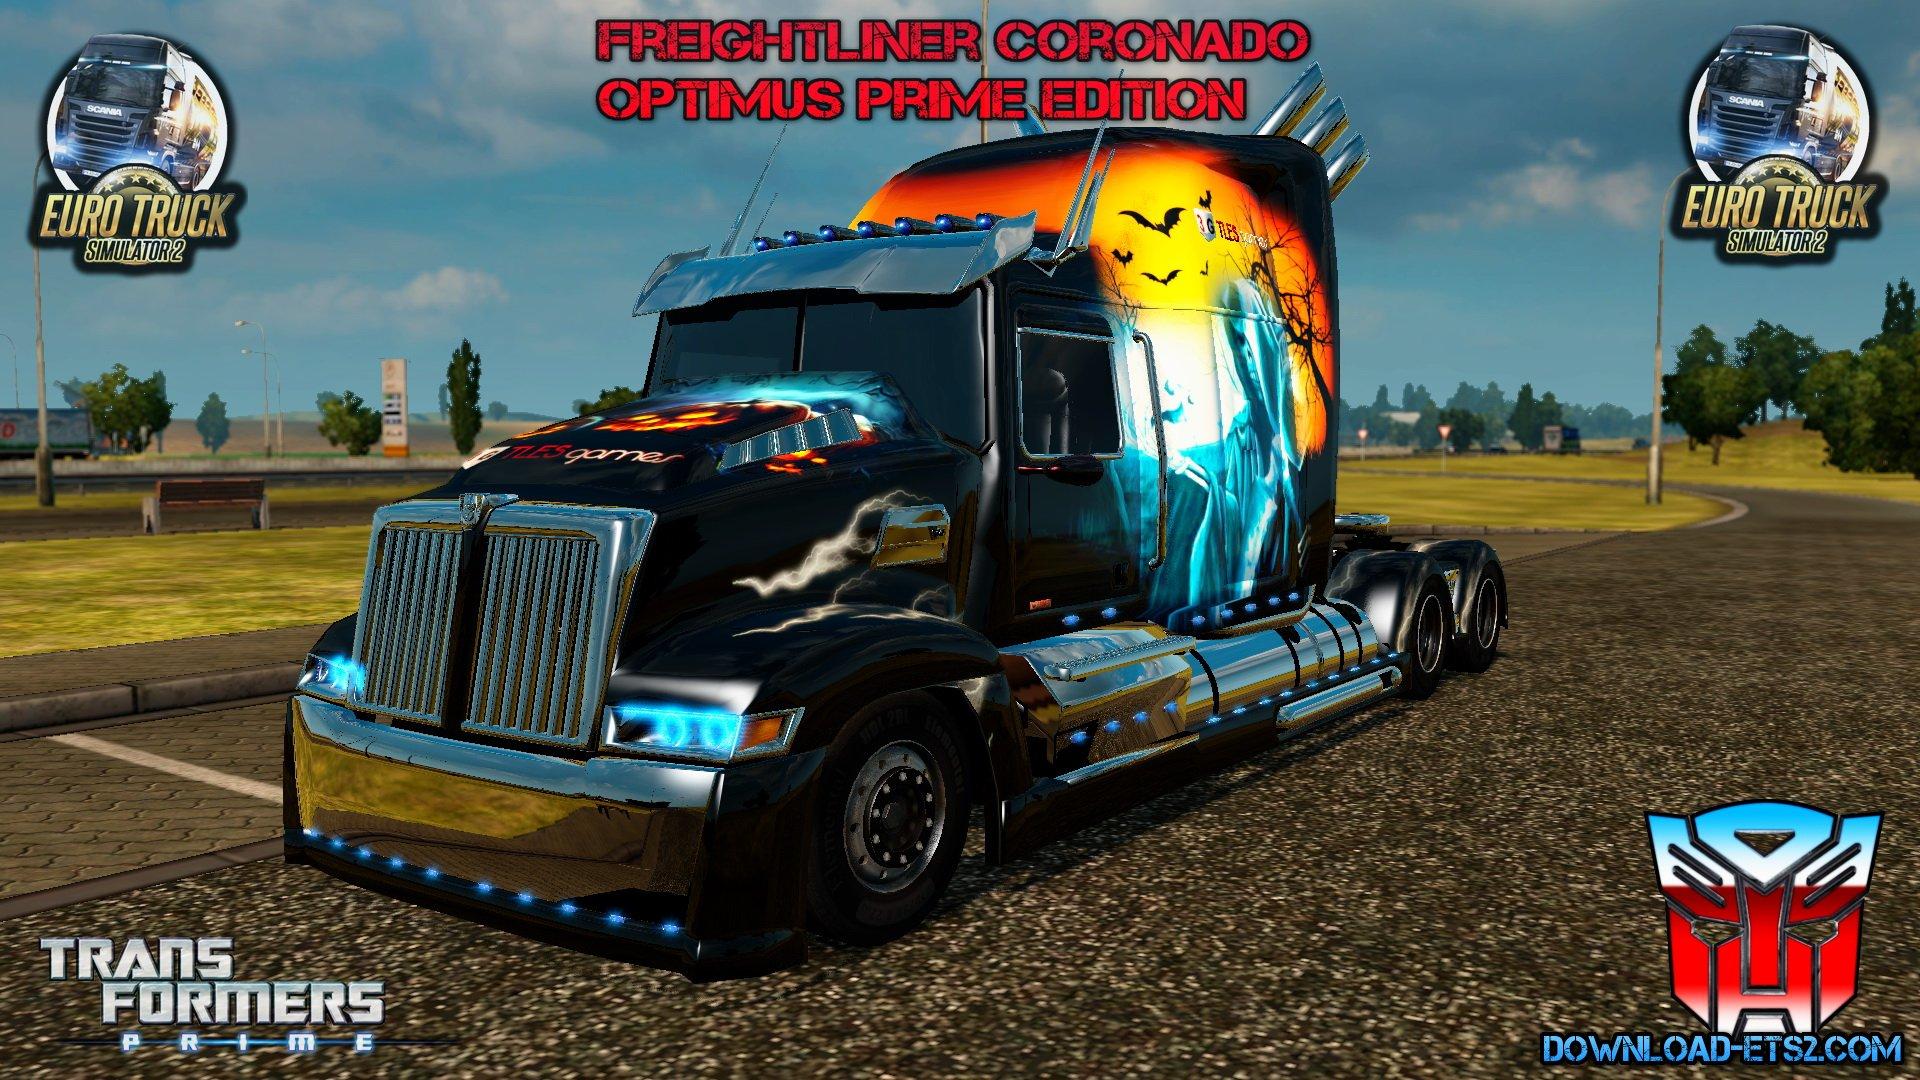 Freightliner Coronado Optimus Prime Trasnsformers 4 [1.22.хх] Upgrade!